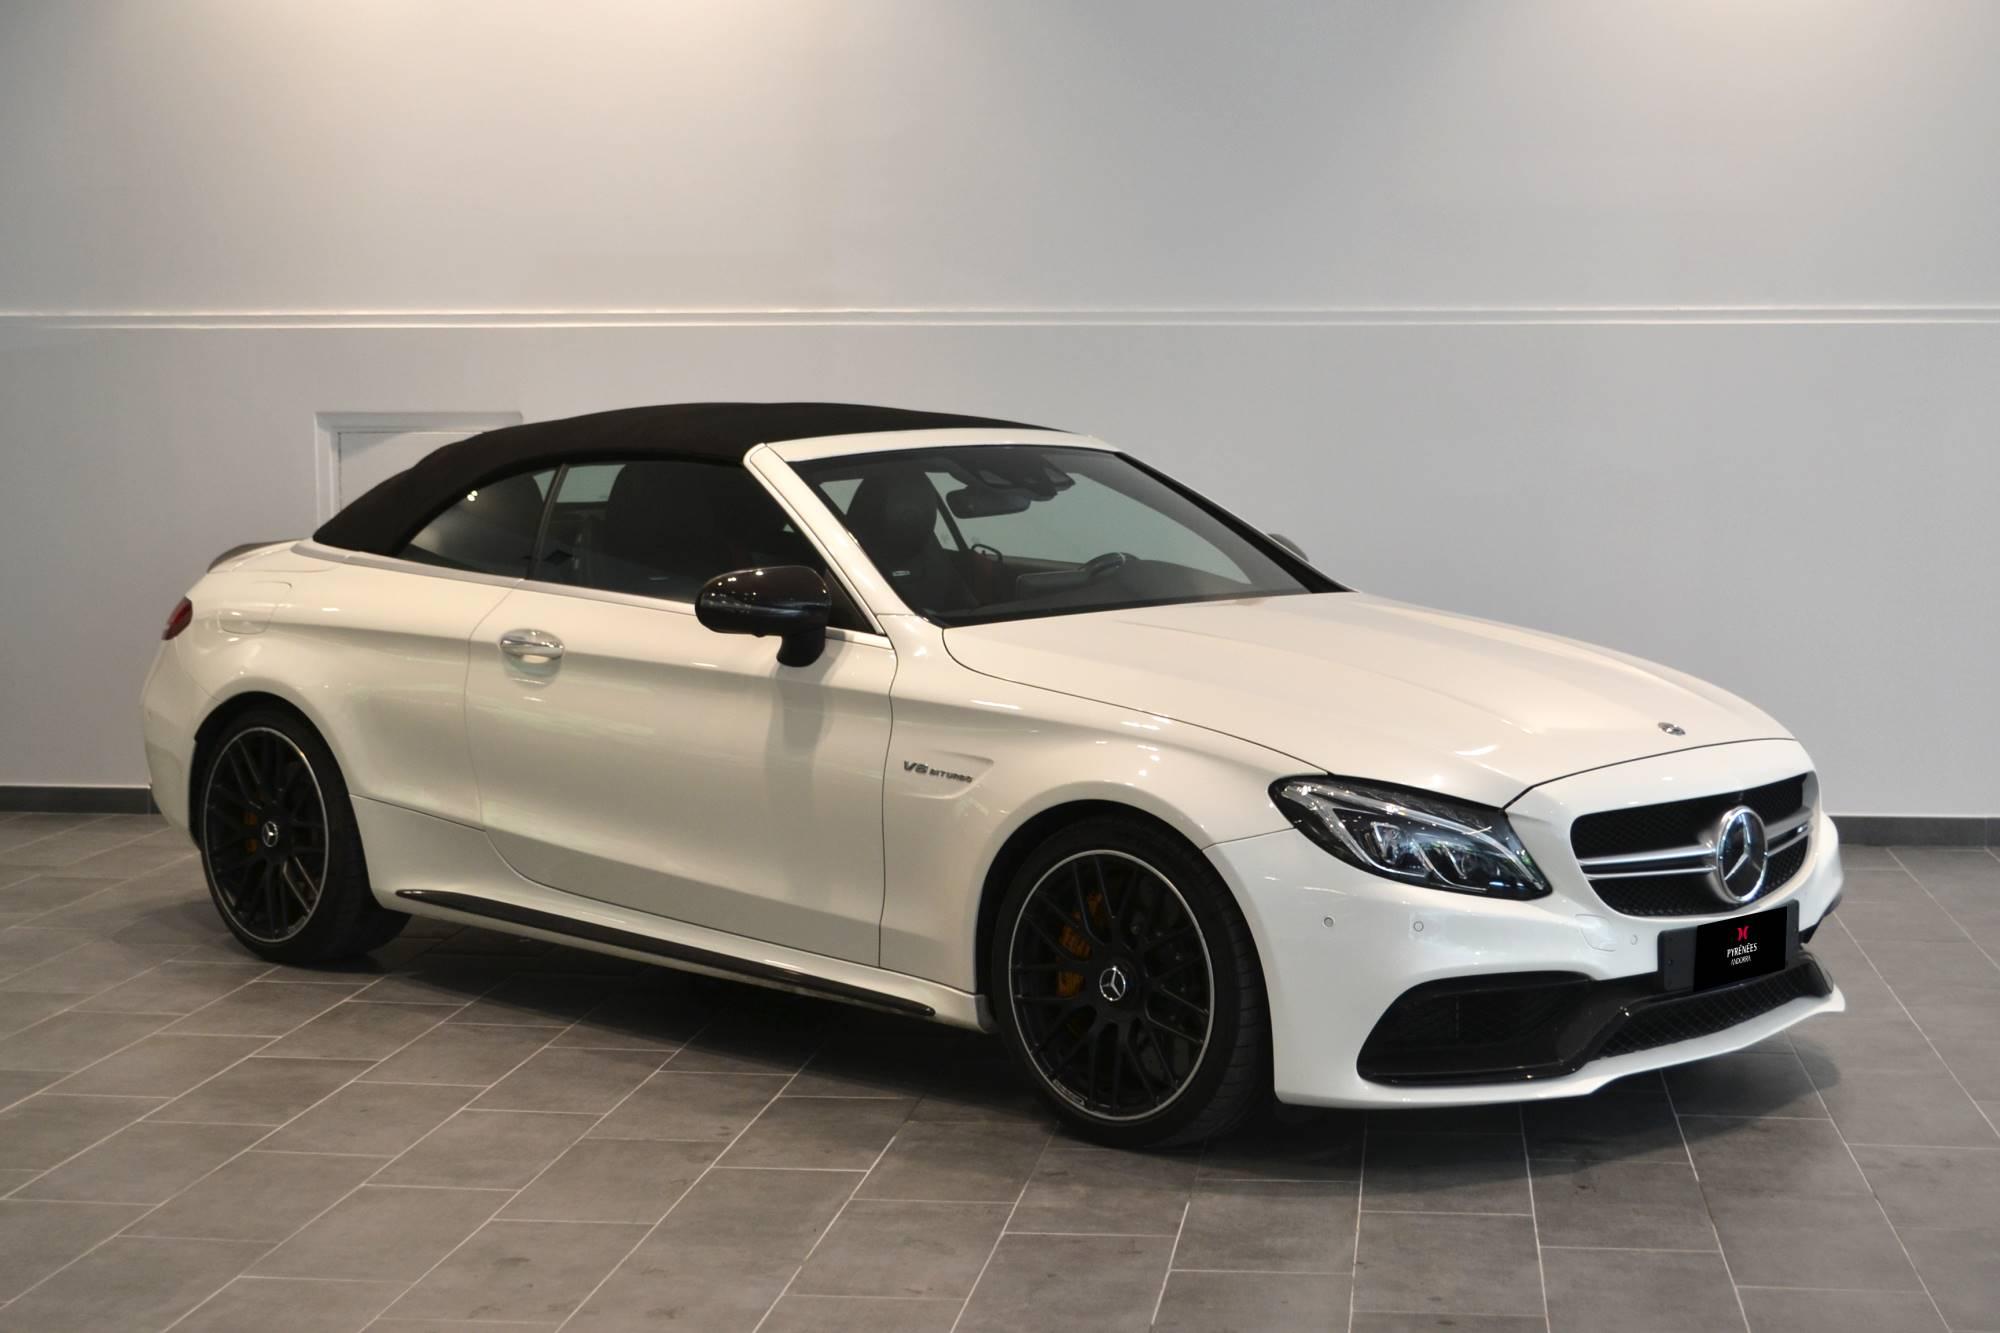 Mercedes-Benz - Clase C Coupé - 63 S AMG 63 S AMG Benzina  2017  112.122 Km